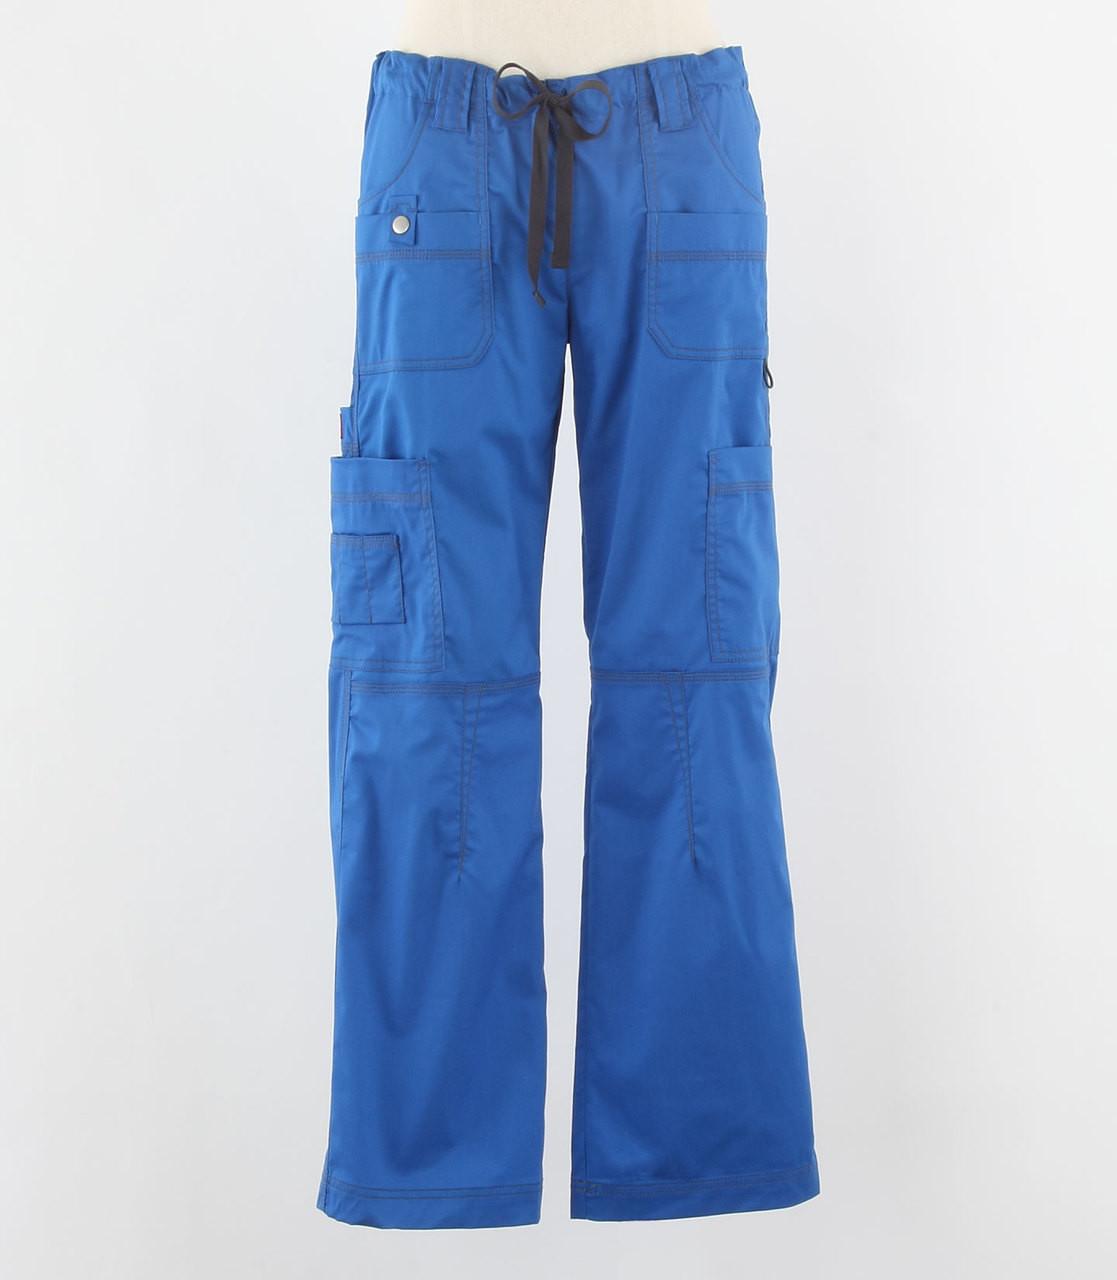 ccf962fc591 Dickies Gen Flex Womens Cargo Scrub Pants Royal - Scrub Med